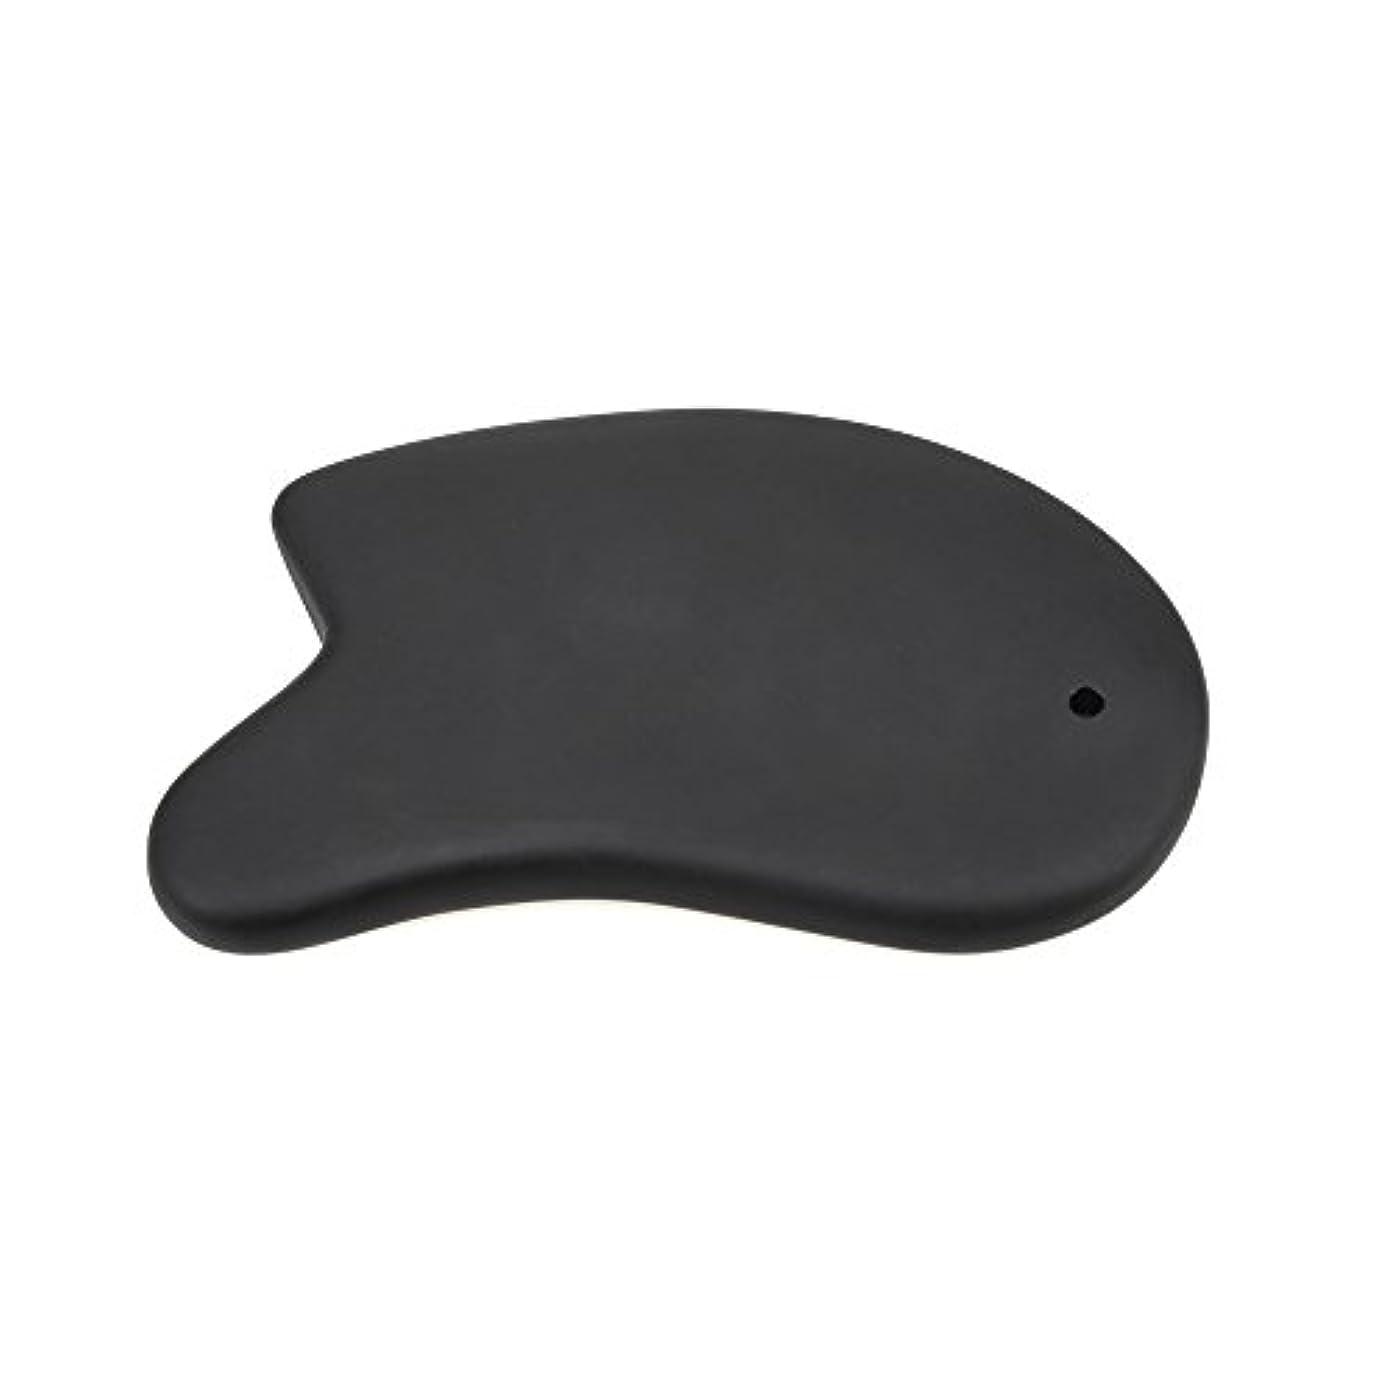 Windfulogo 刮痧板 手作りグアシャ擦りマッサージツールグラストンスパ用の天然ビアンストーングアシャーボード顔、背中、首、肩に鍼治療